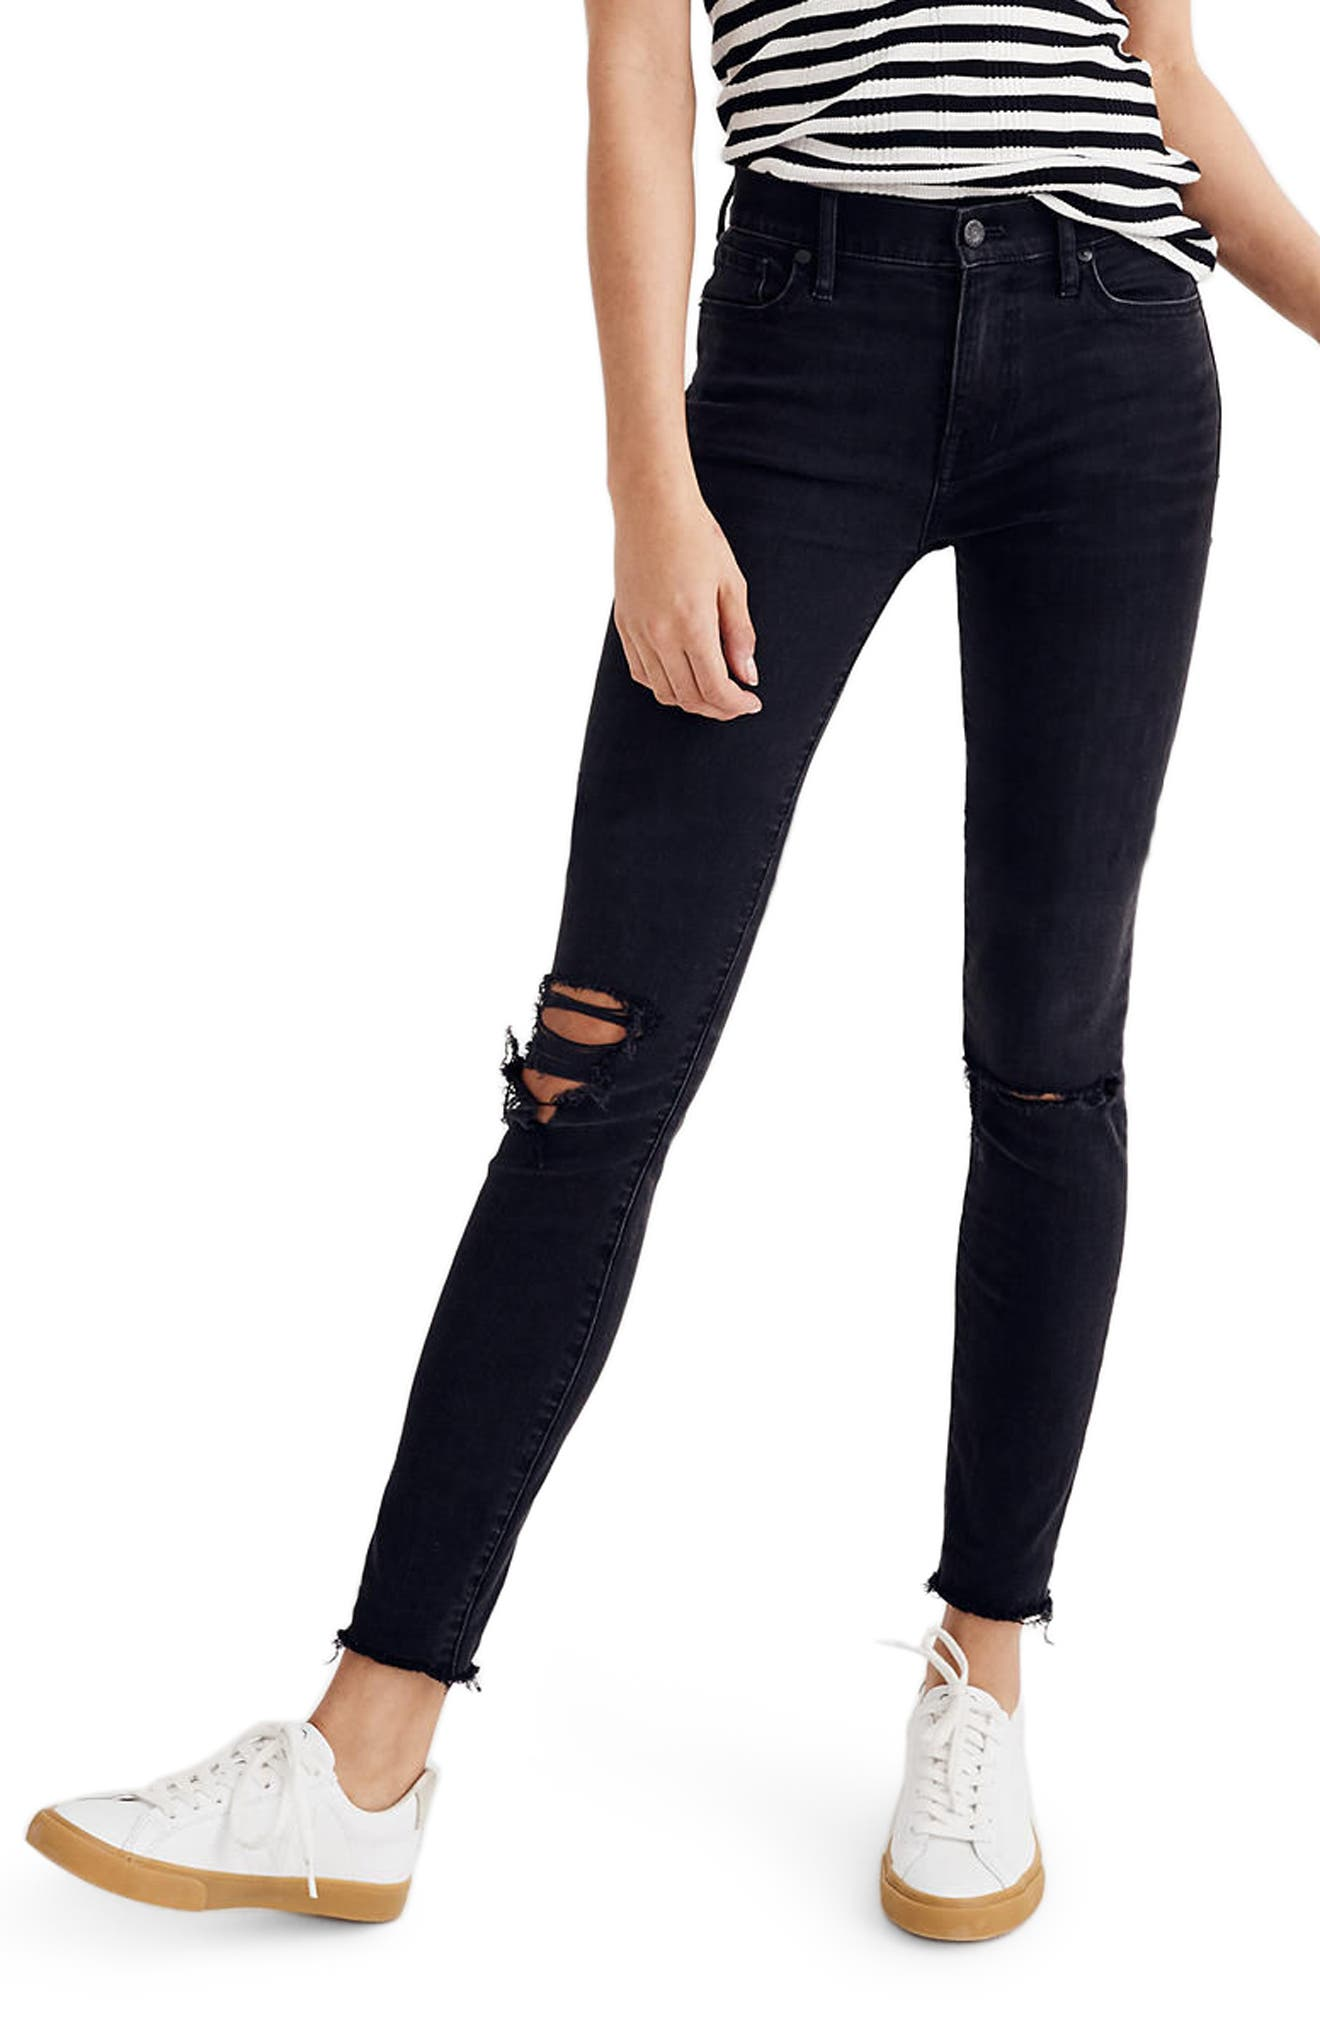 9-Inch High Waist Skinny Jeans,                         Main,                         color, Black Sea